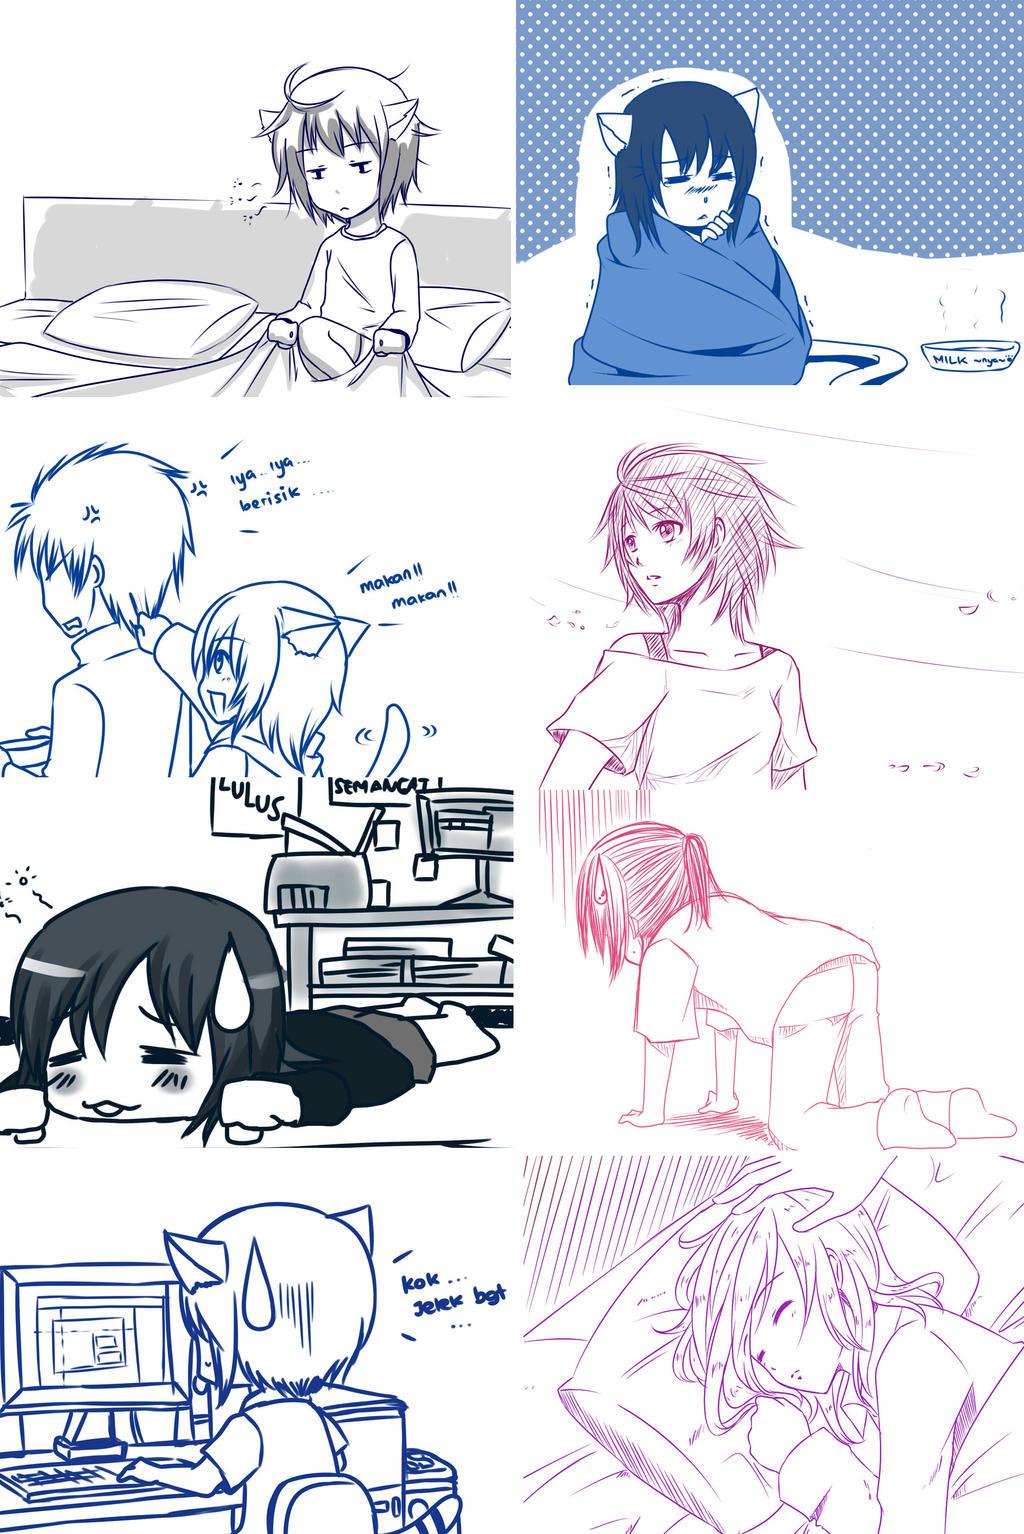 Random doodle by kairikazu